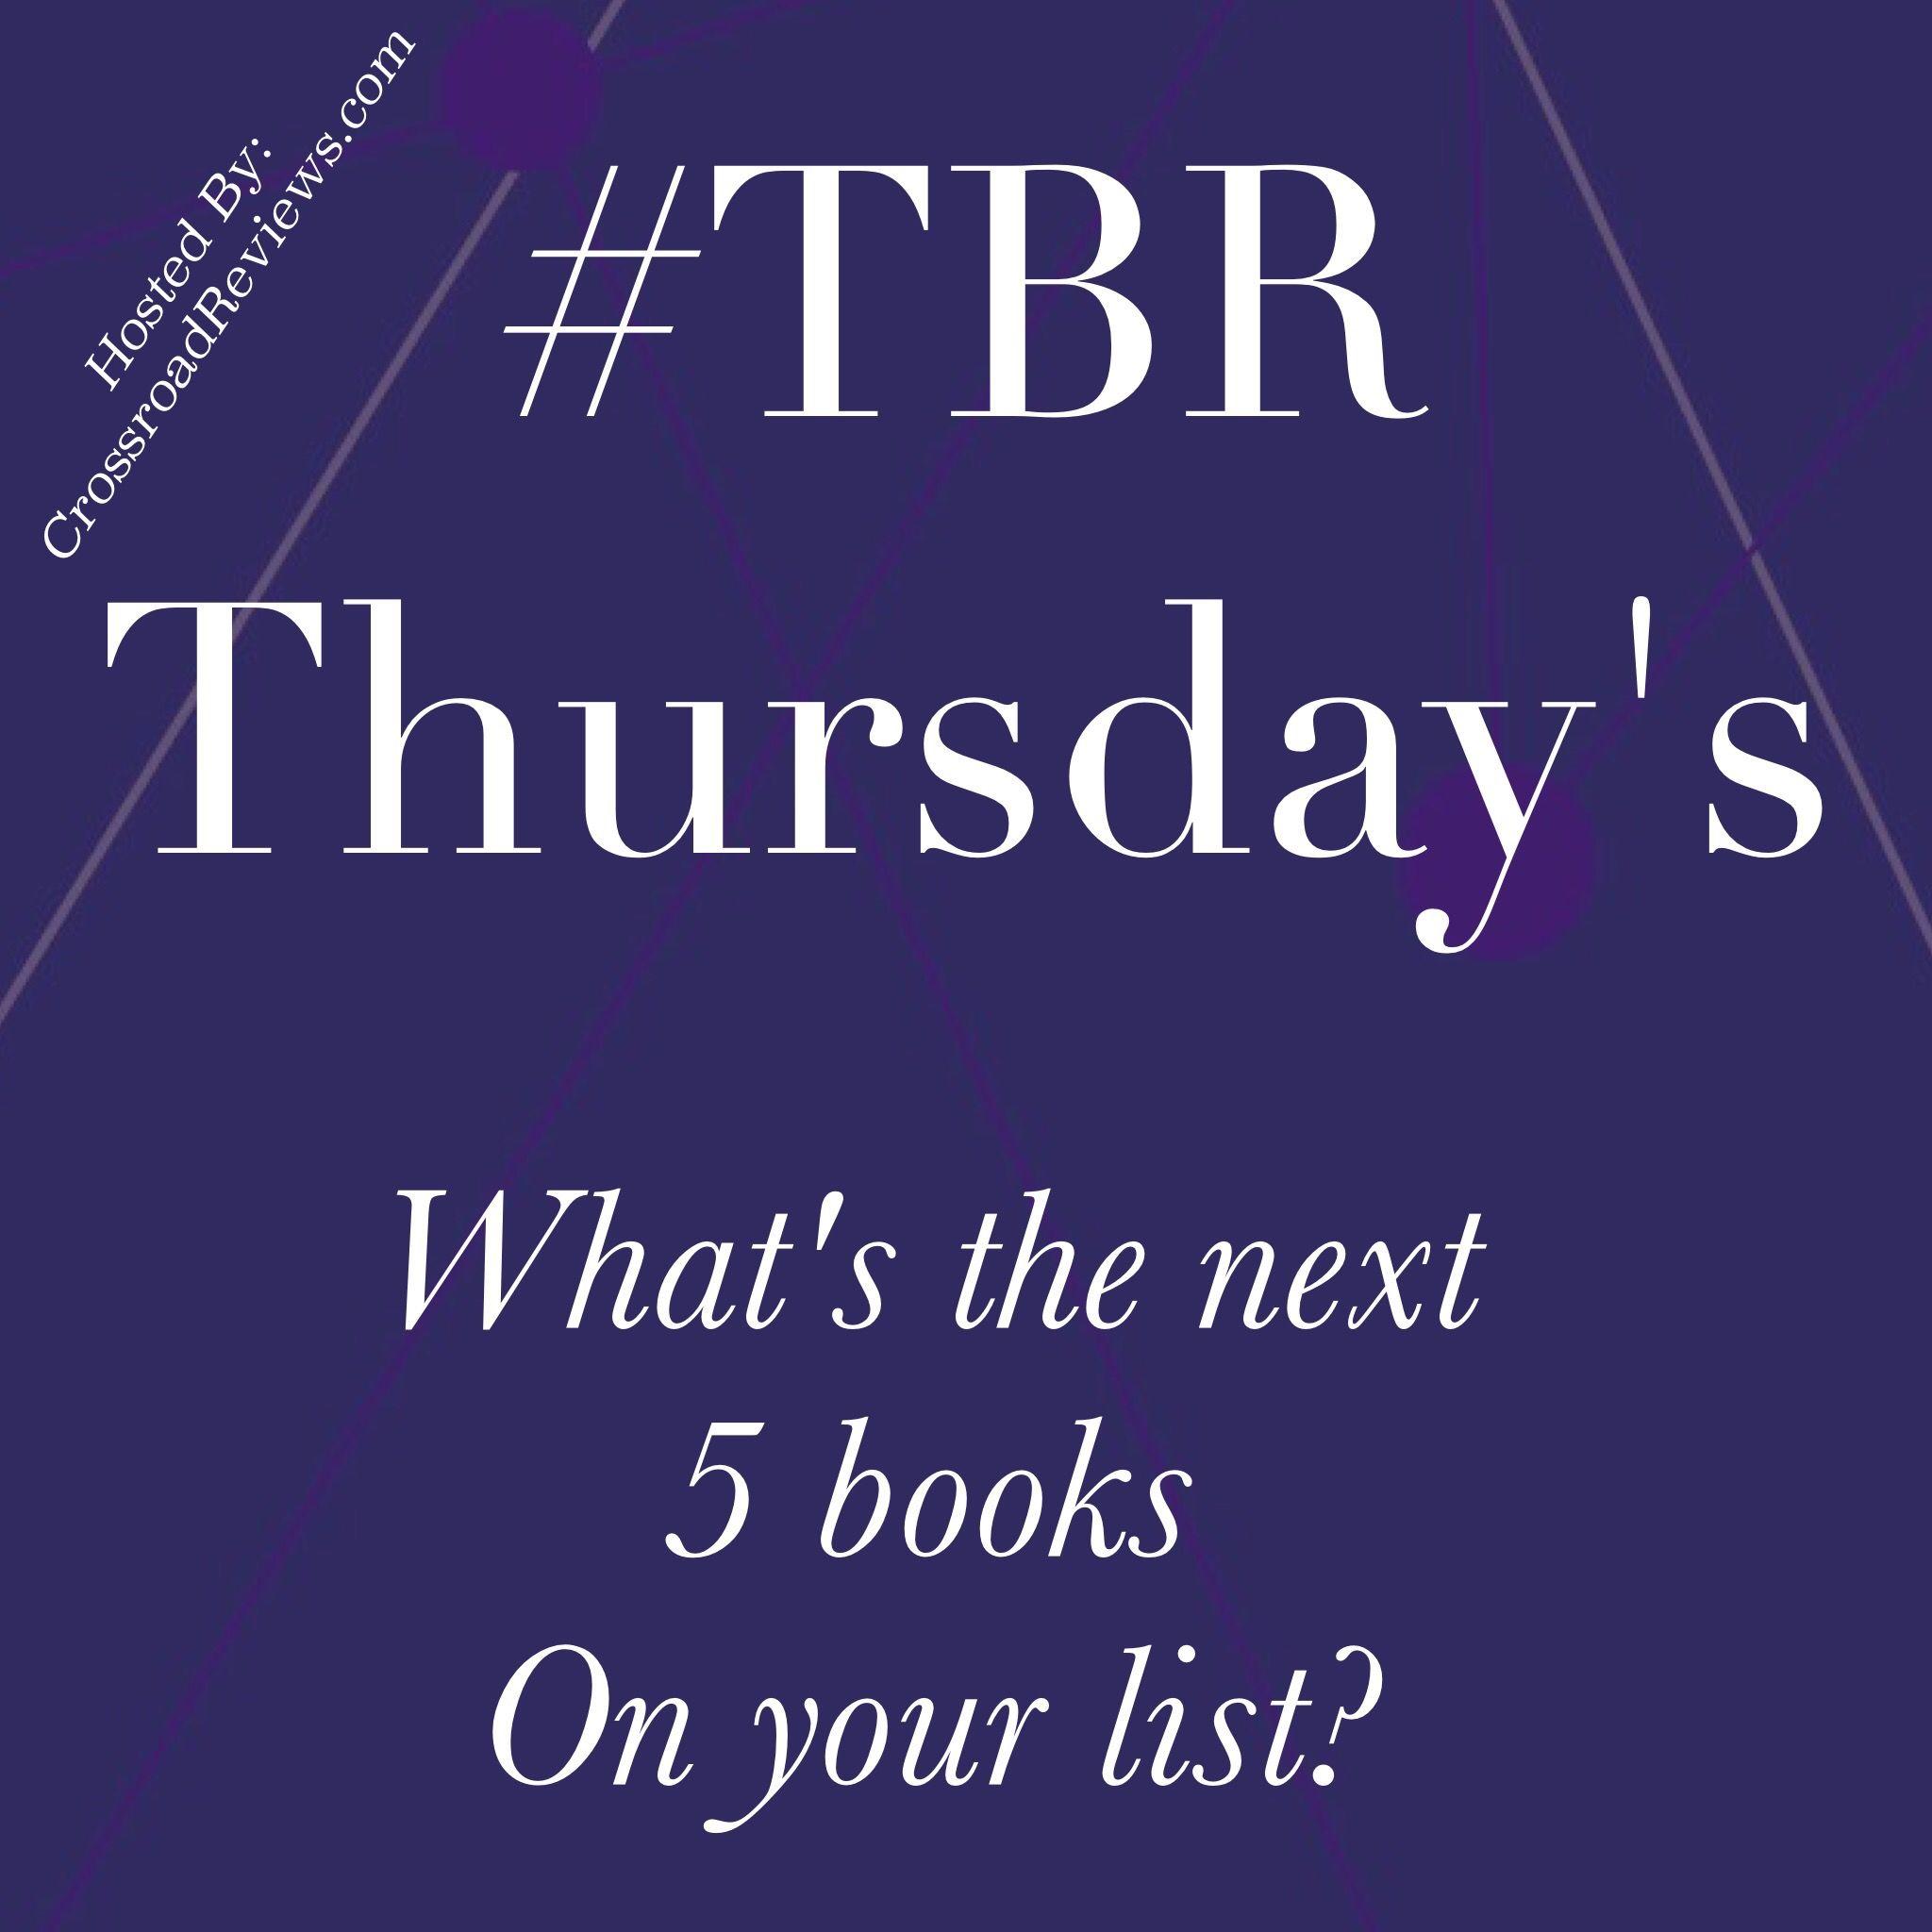 #TBR #Thursdays What the next 5 #Books on your list?